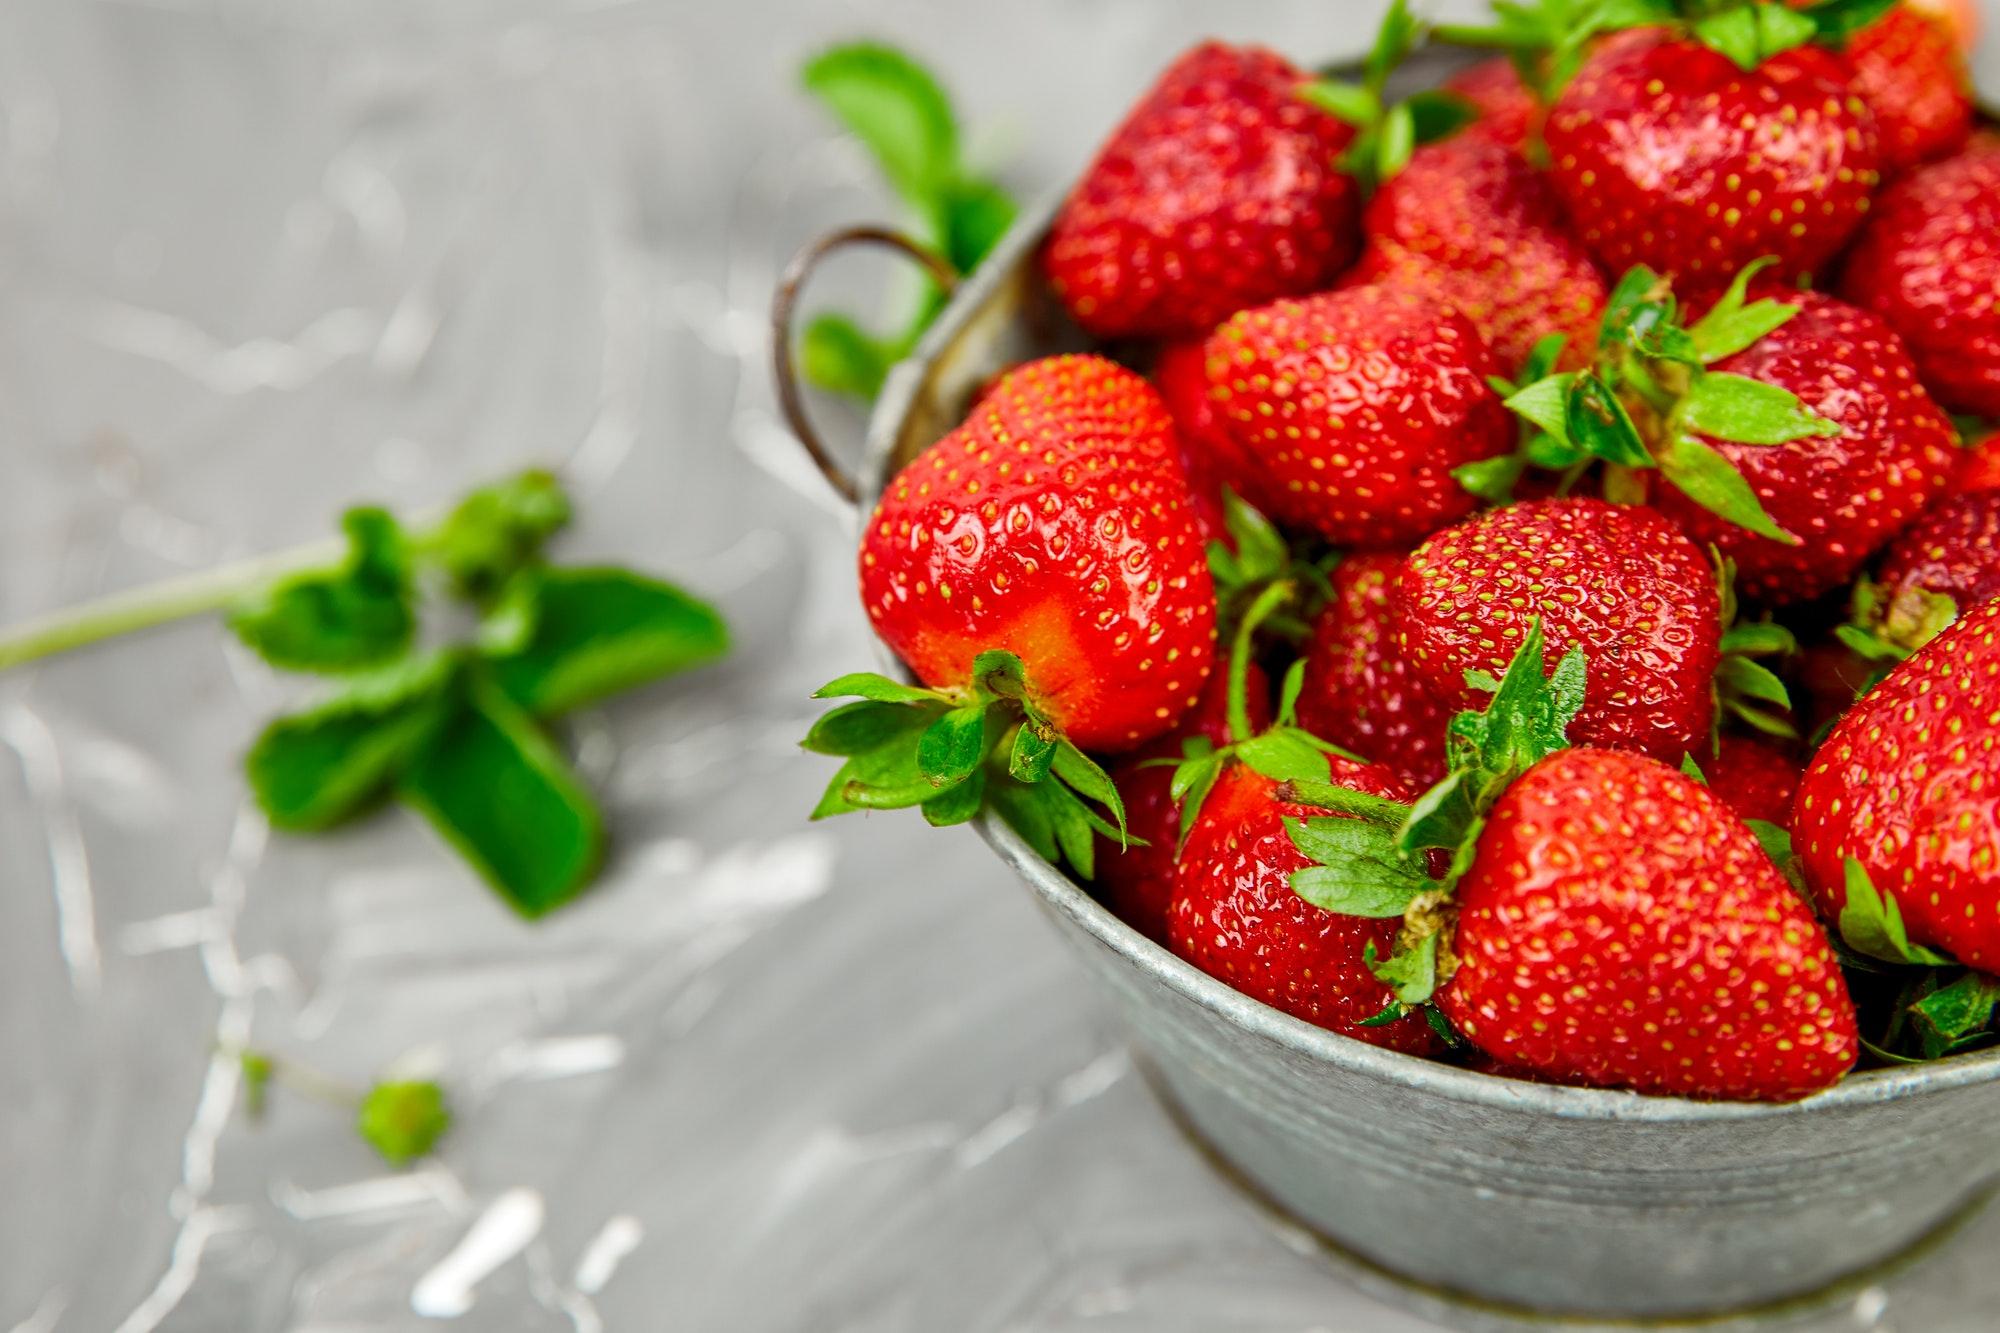 Strawberry gift ideas